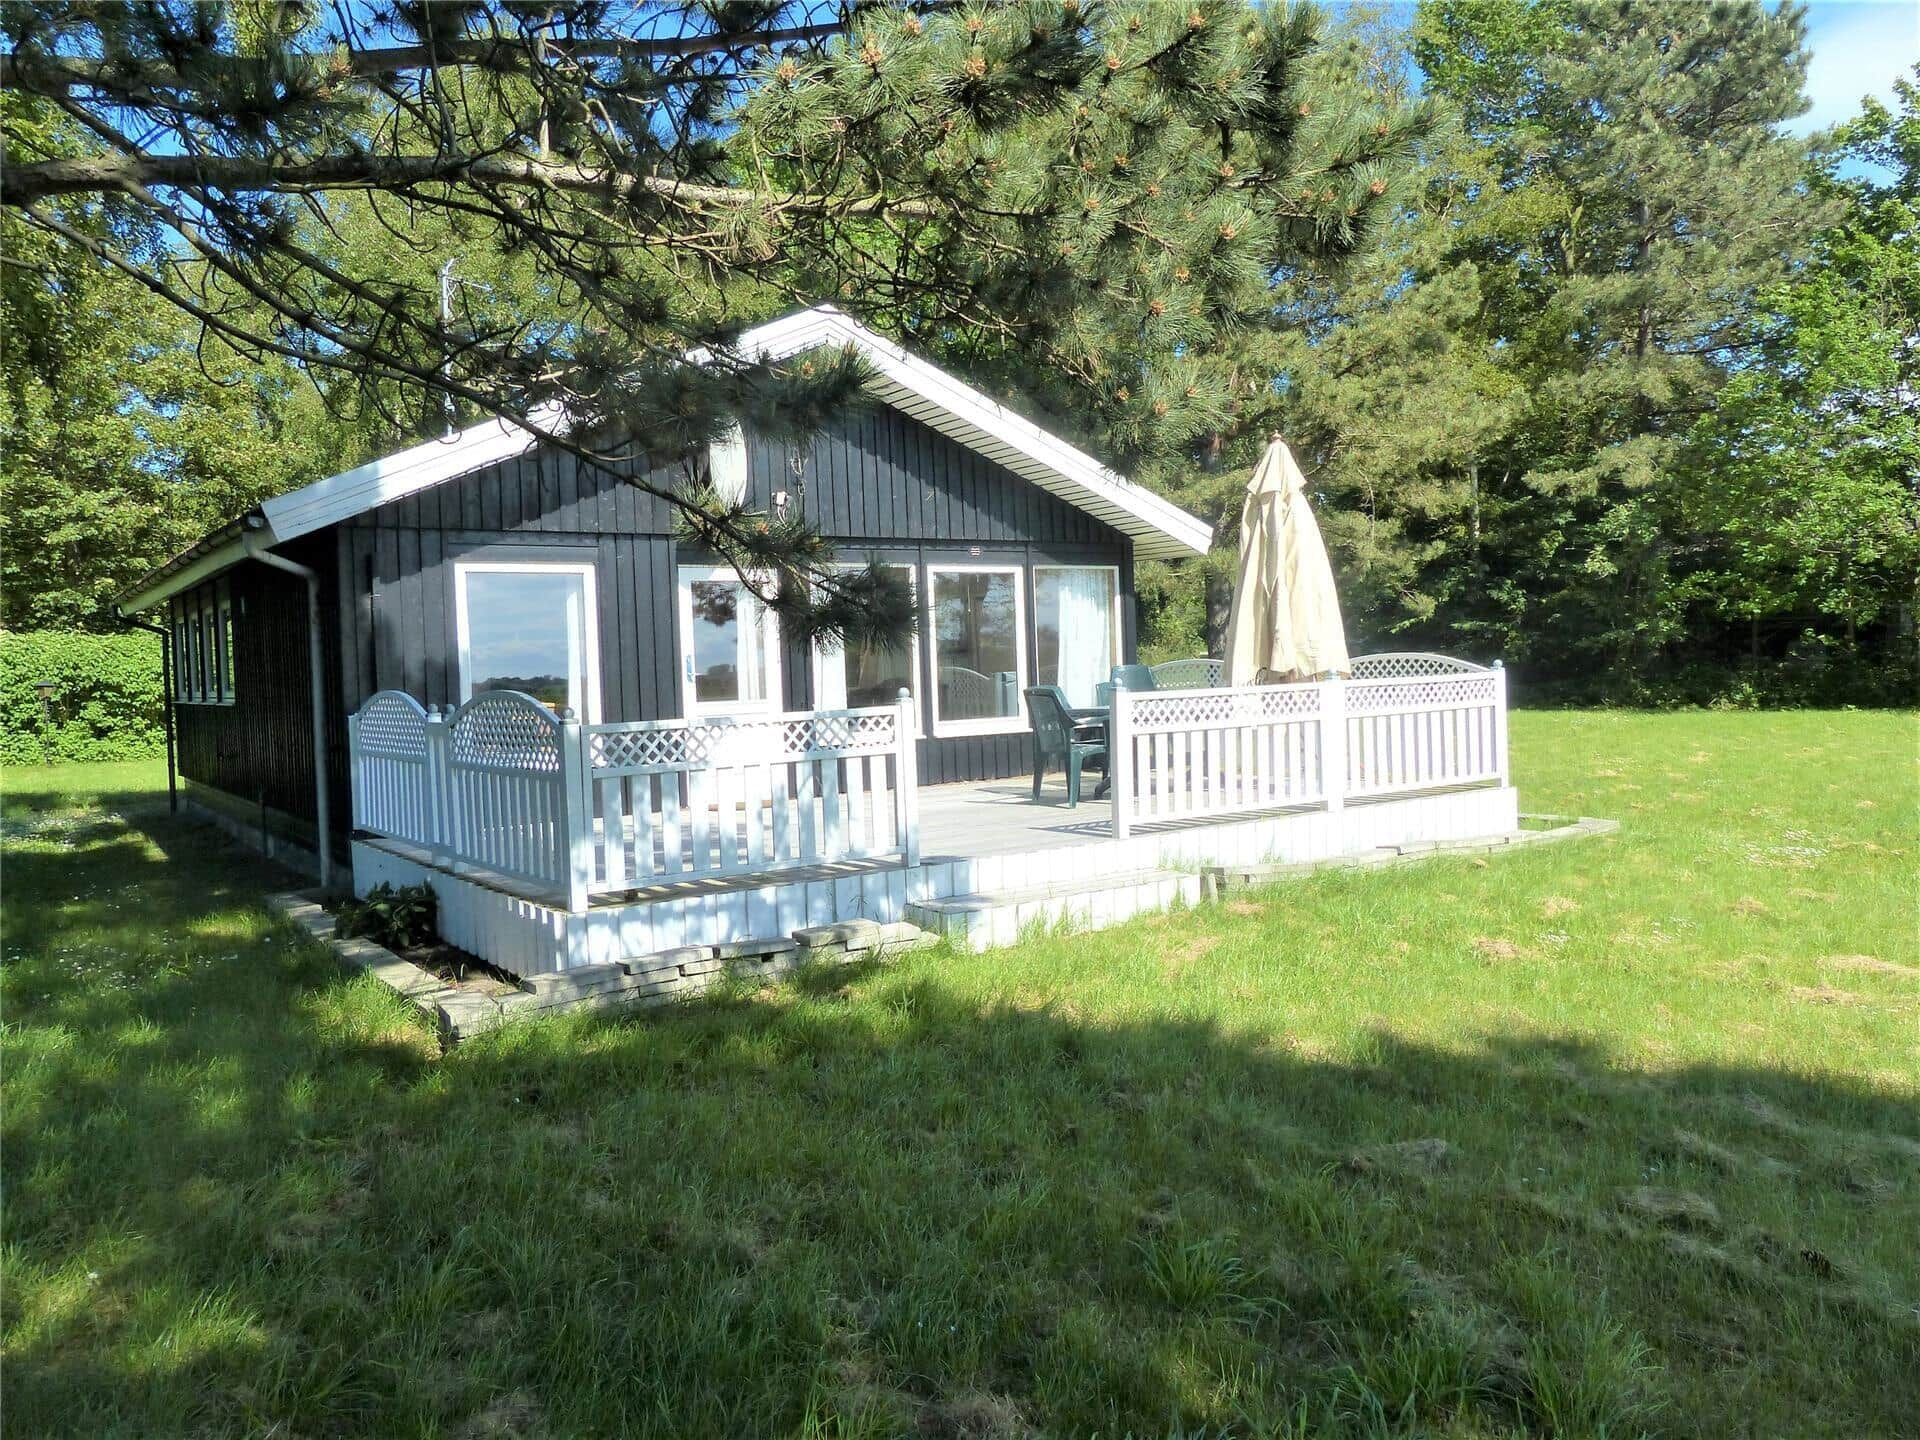 Billede 1-17 Sommerhus 11808, Søvang 18, DK - 4500 Nykøbing Sj